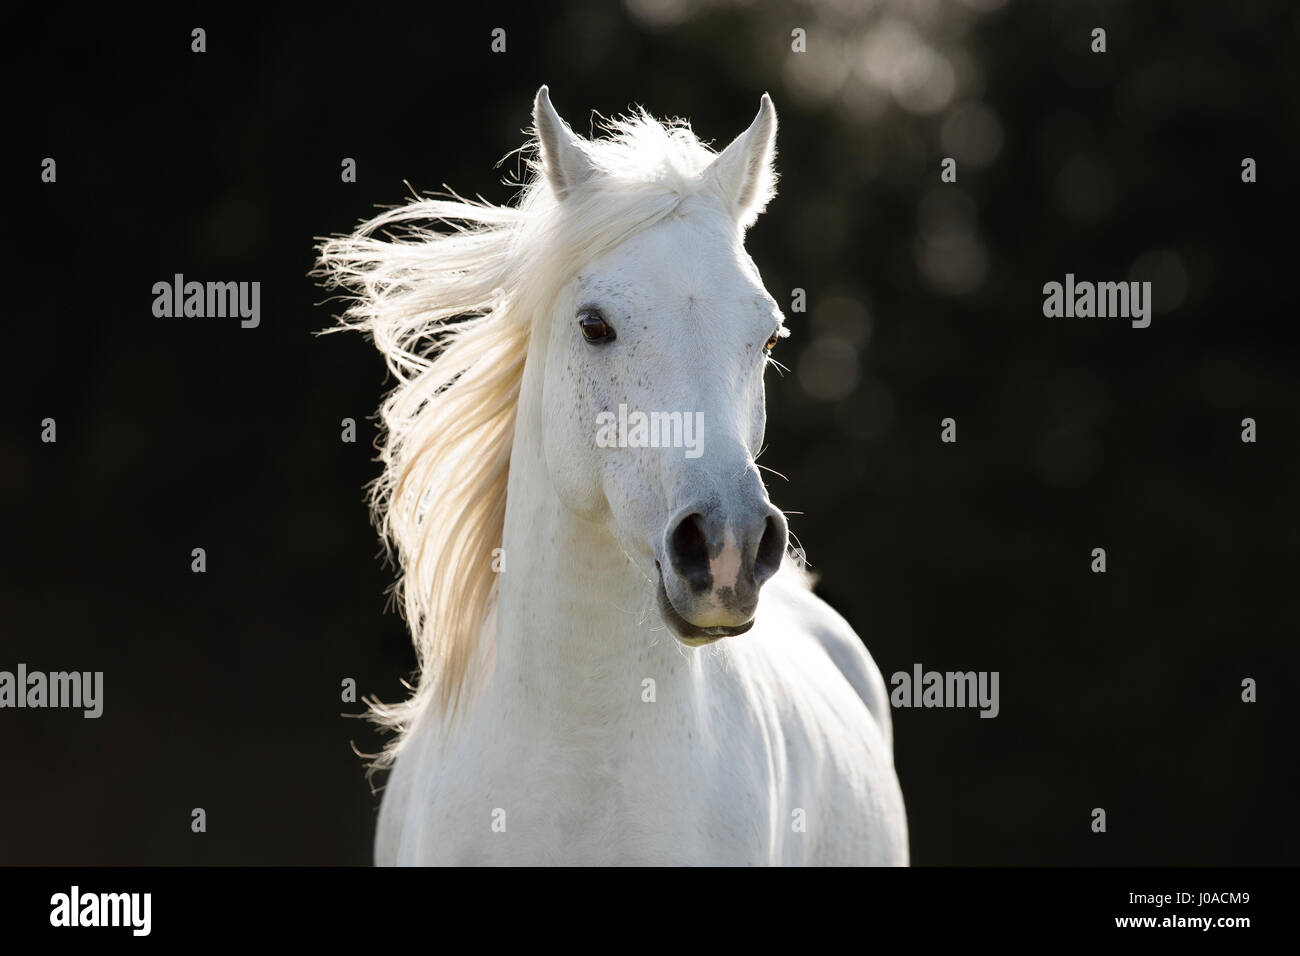 White Arabian Stallion Galloping Portrait Stock Photo Alamy